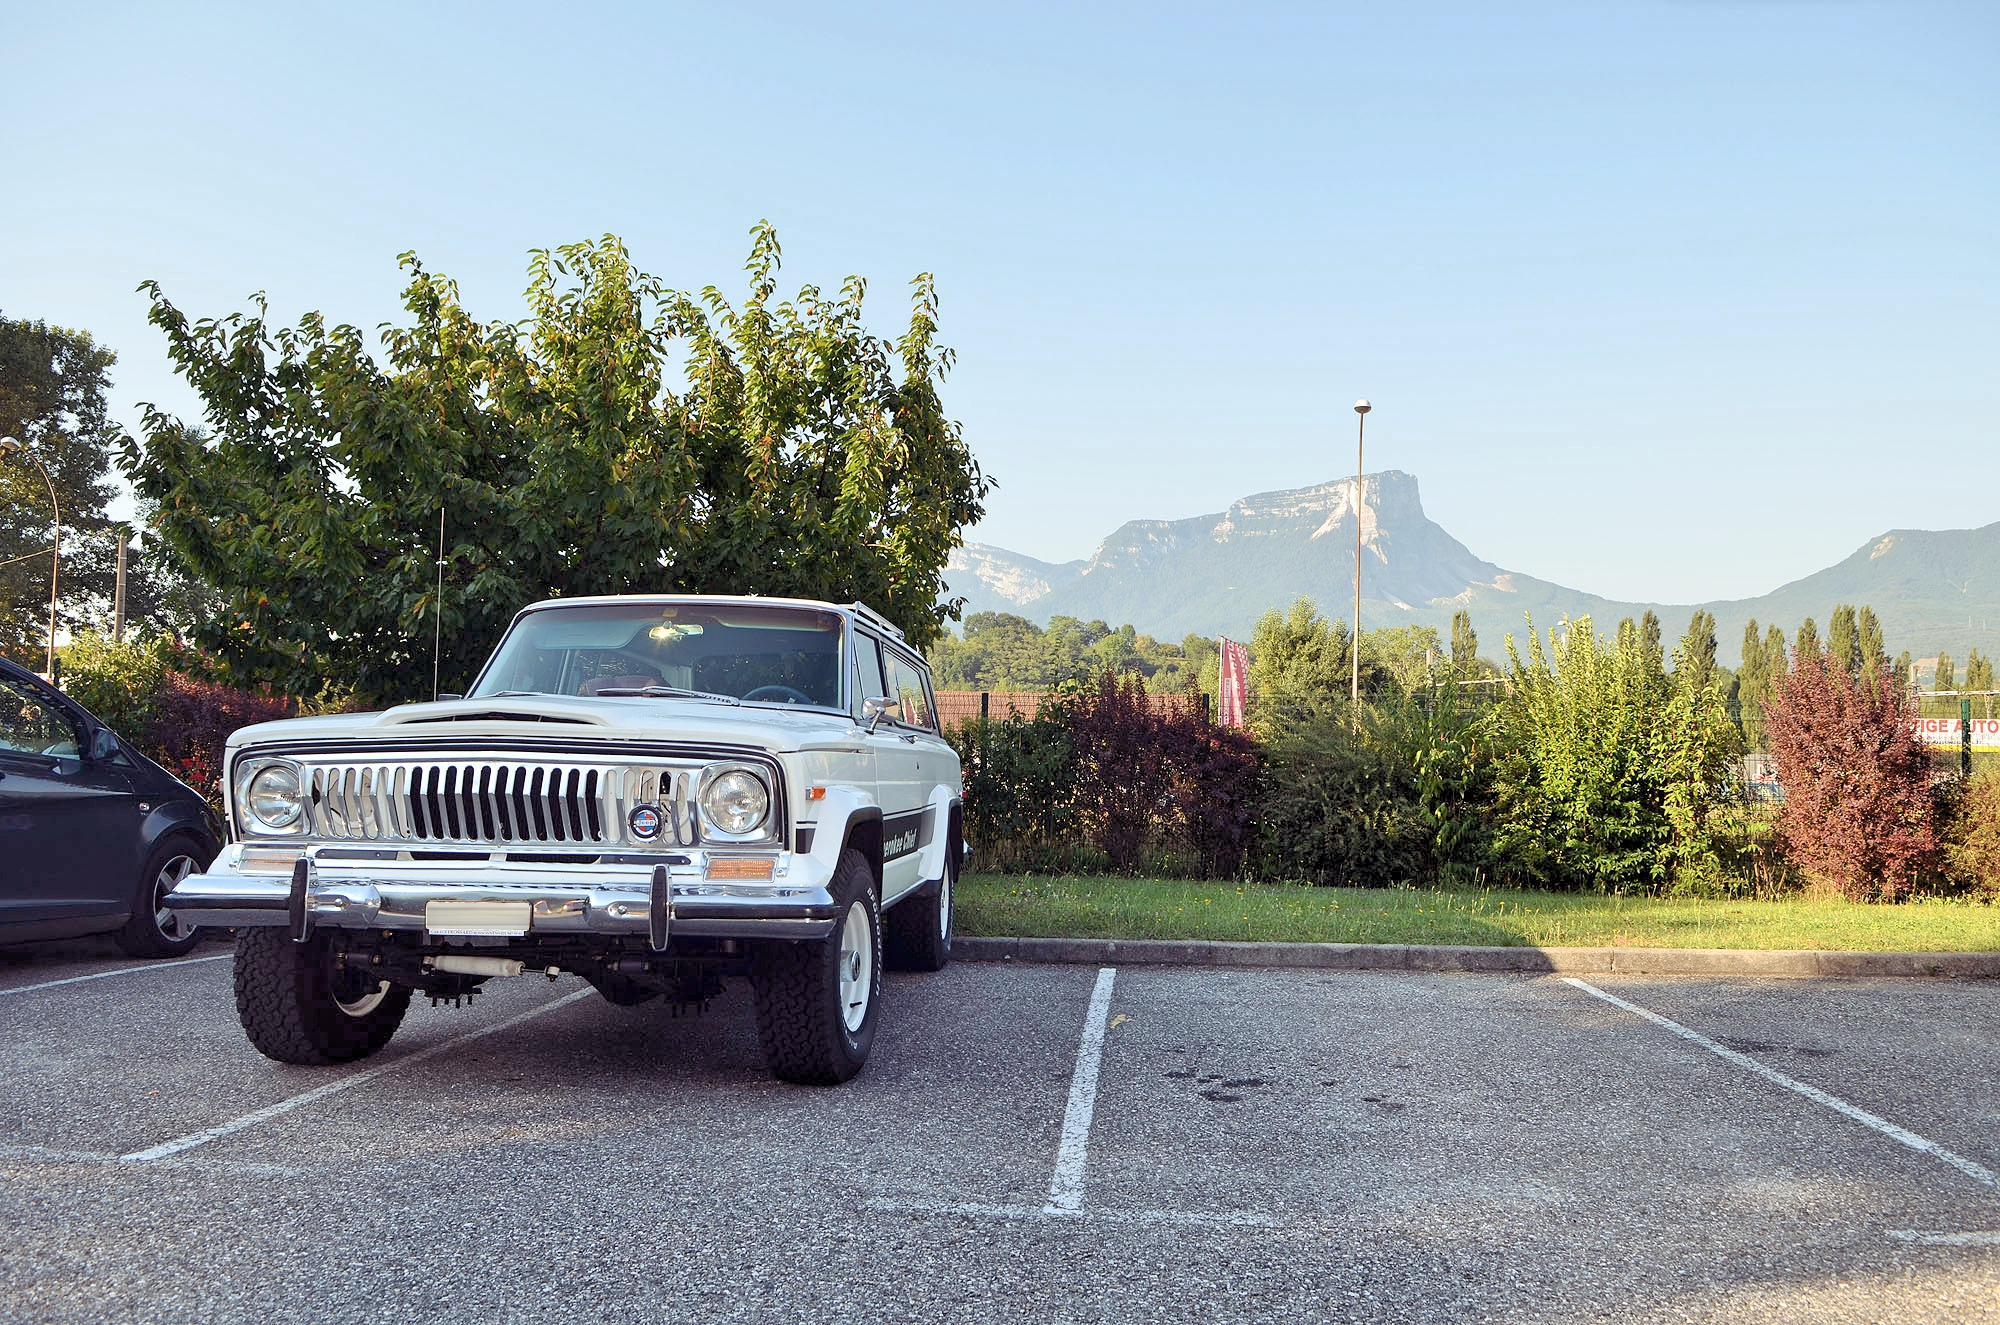 _jeep-cherokee-chief-valloire-017.JPG